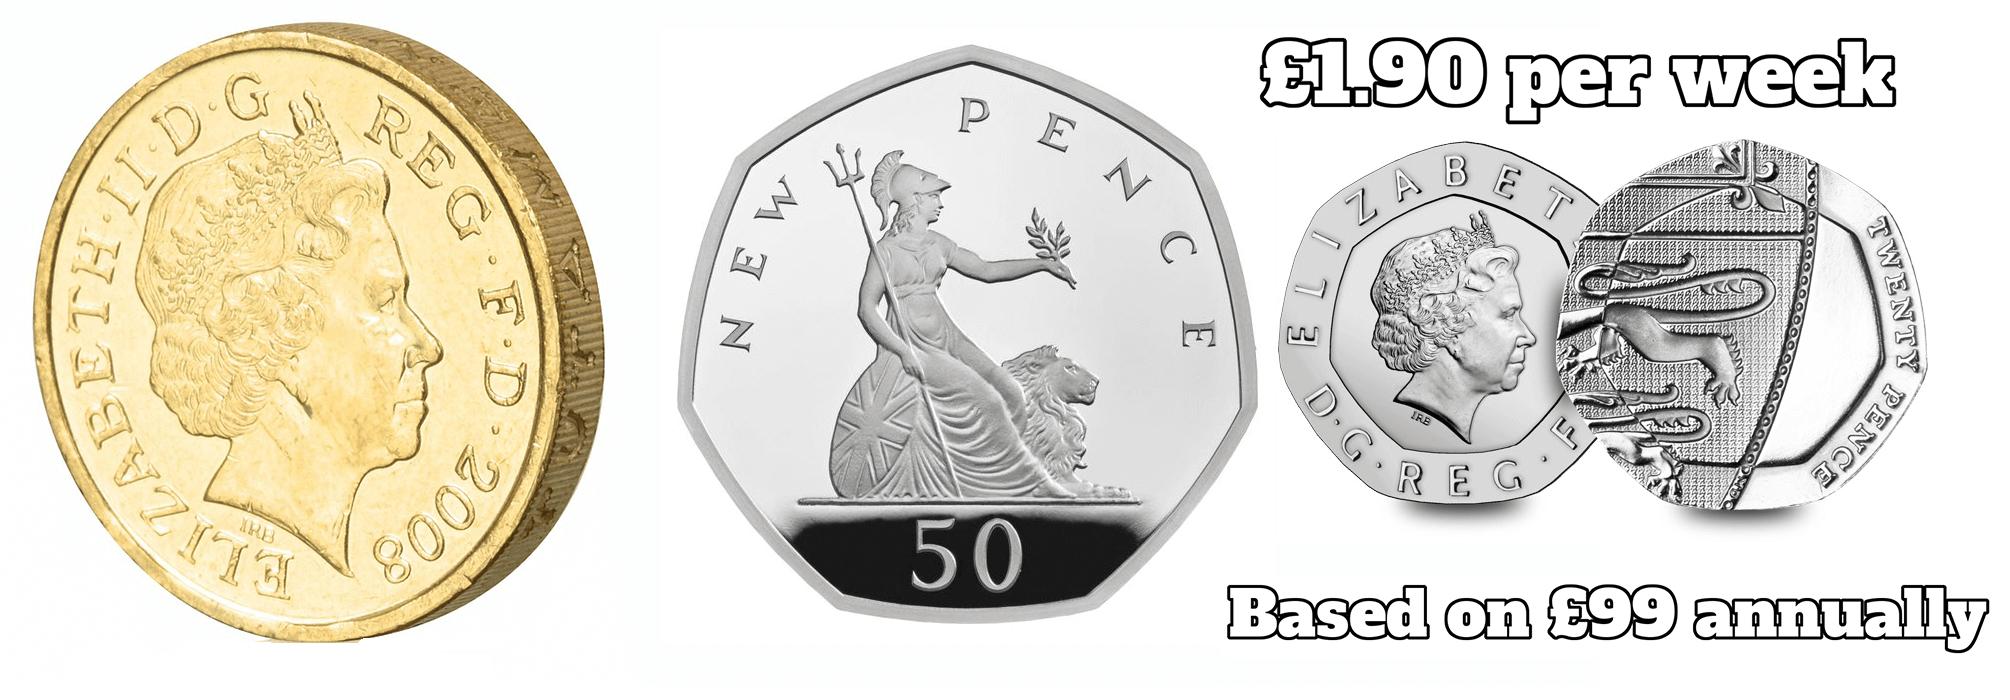 190-900